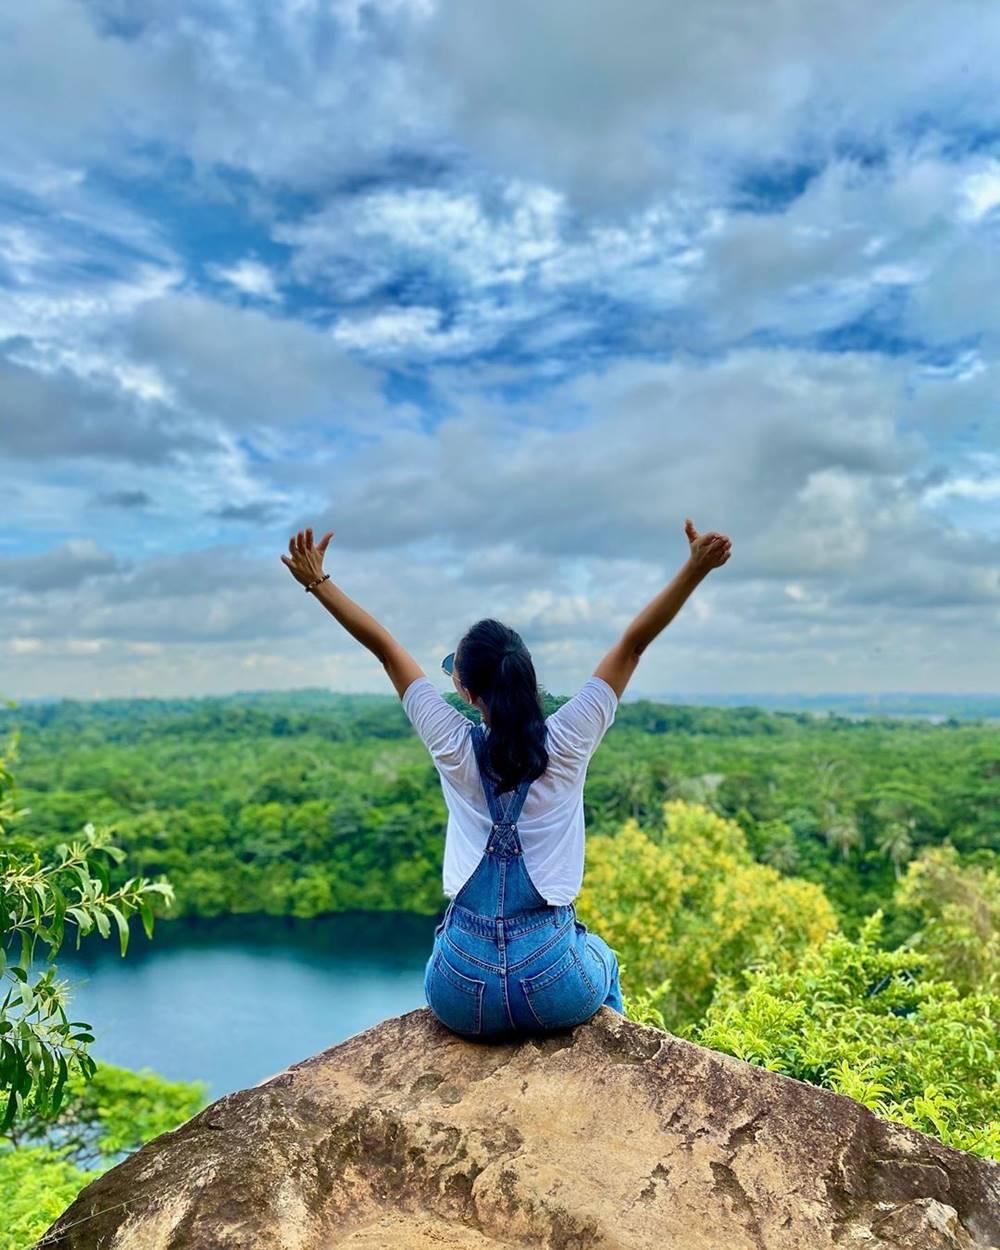 Pulau Ubin. Instagram @lindamcgonial